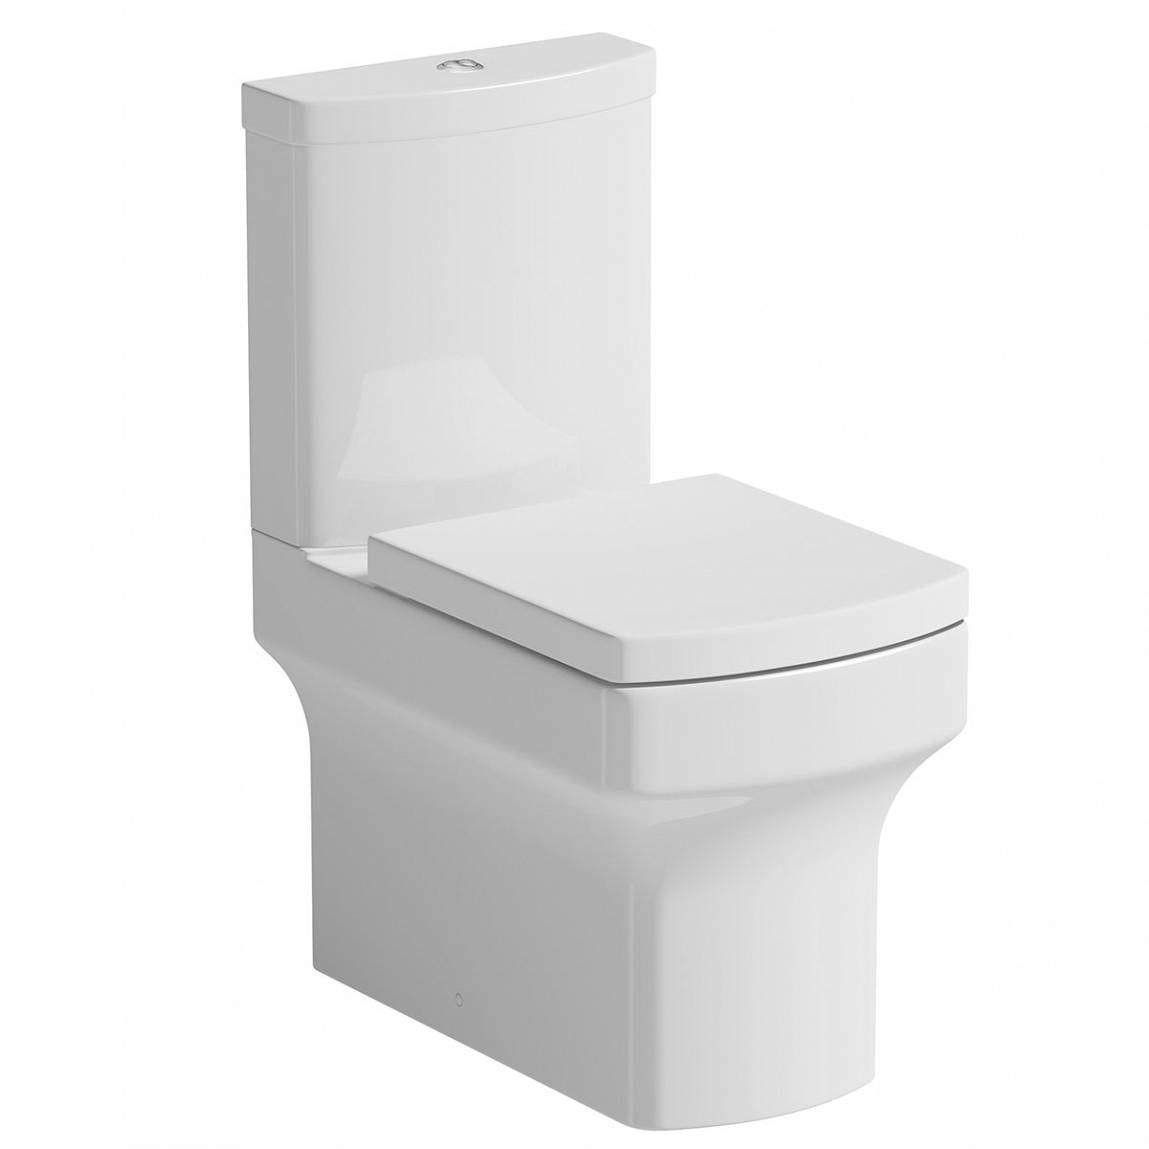 Wye Close Coupled Toilet inc Soft Close Seat